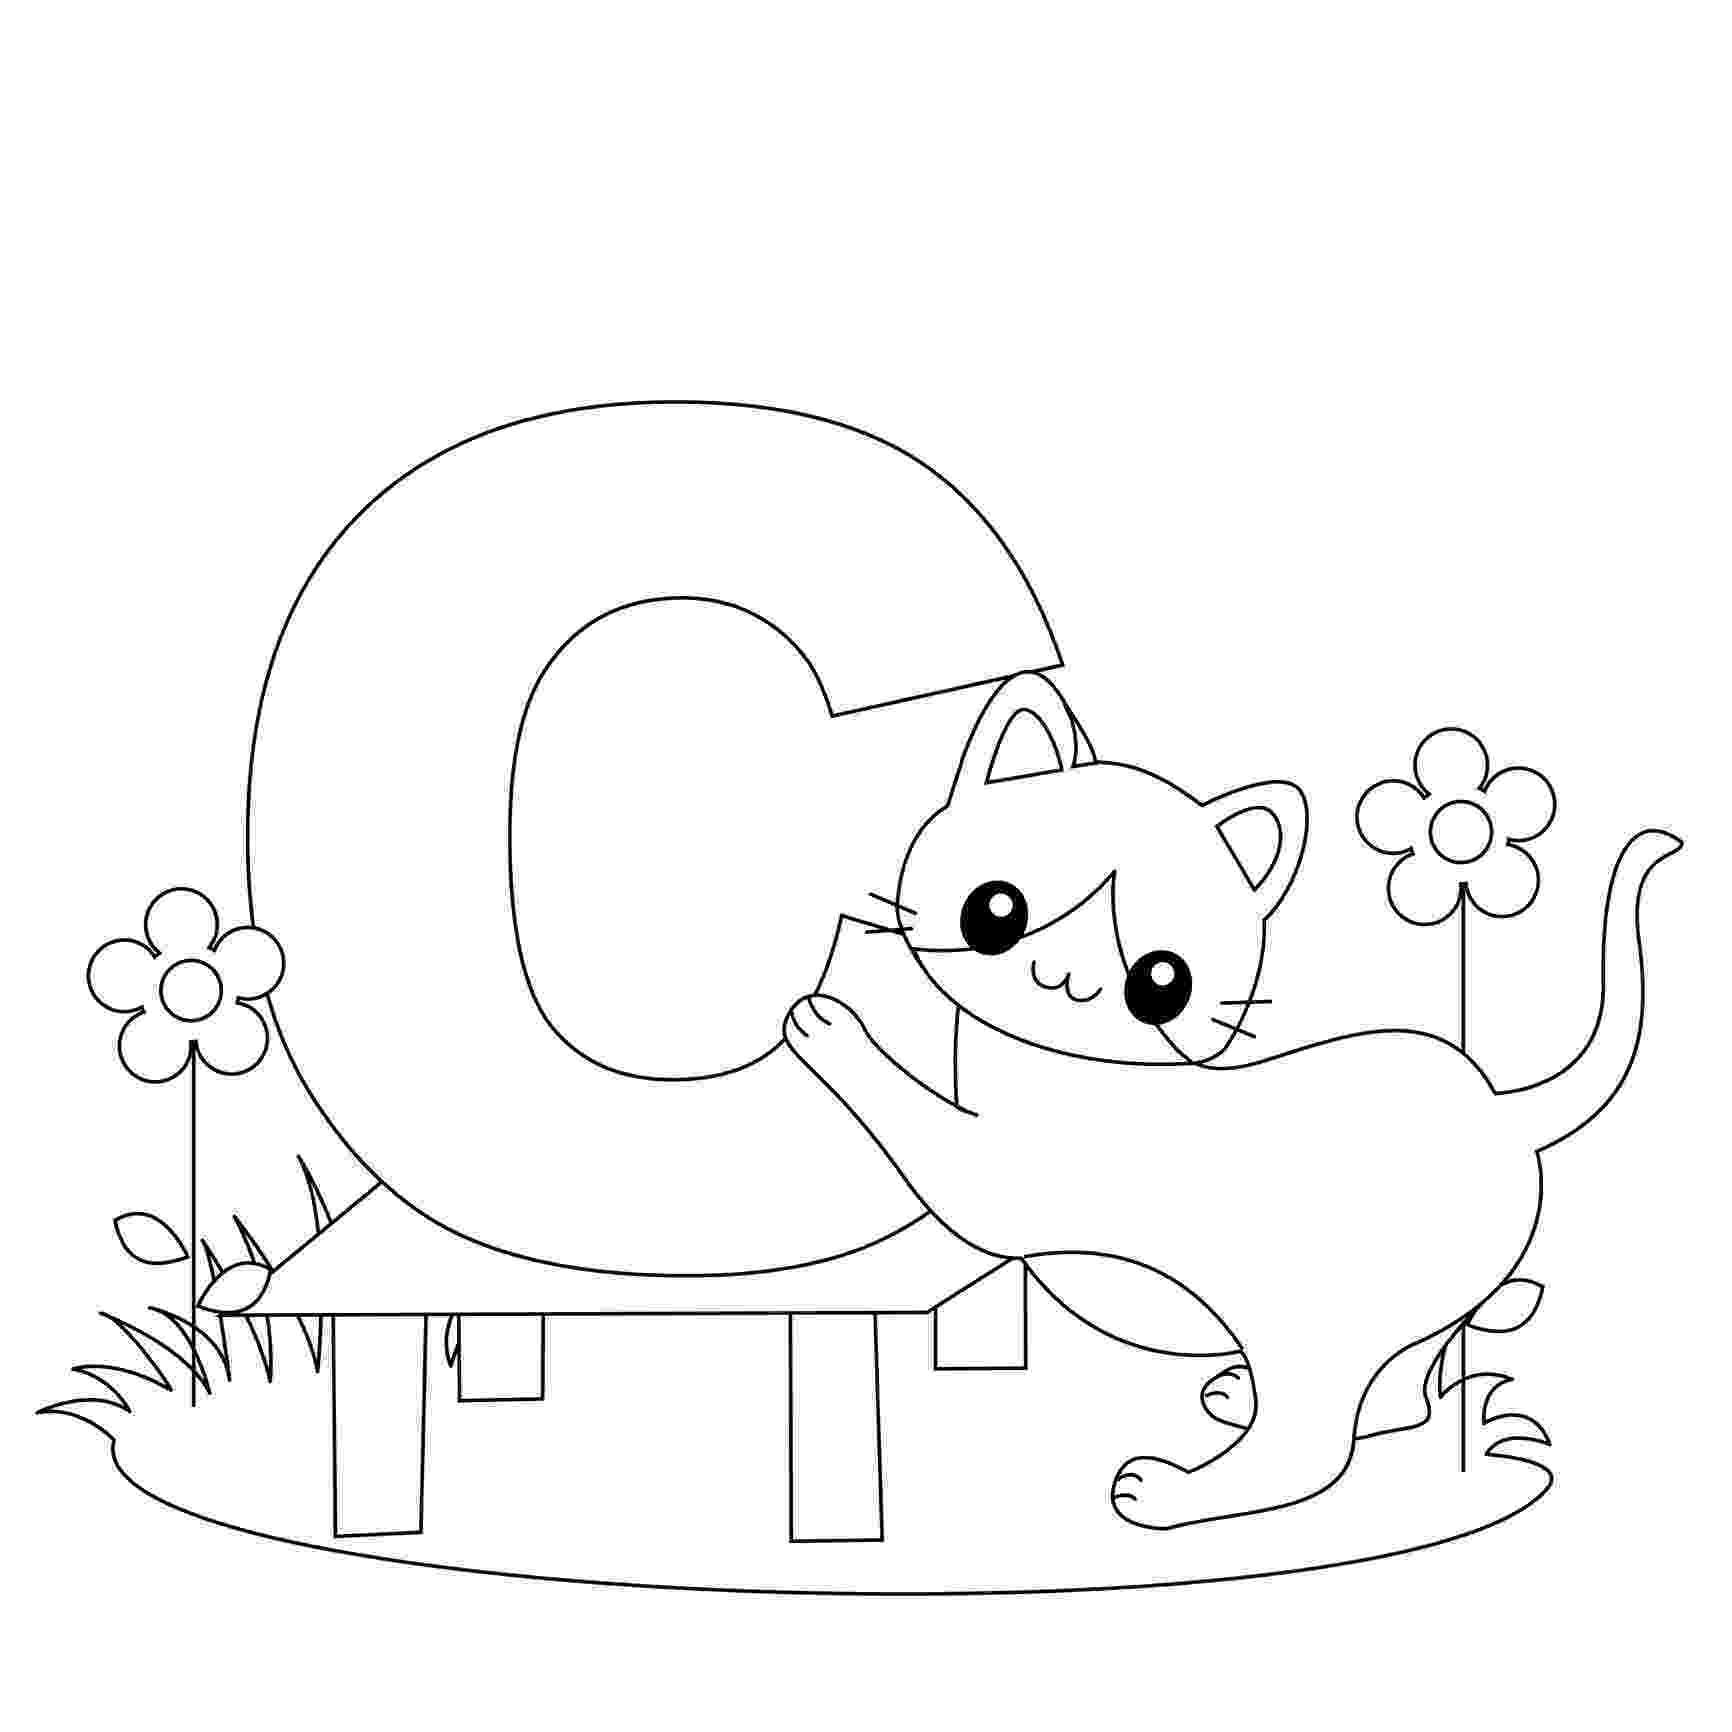 coloring book alphabet free printable alphabet coloring pages for kids best book coloring alphabet 1 1